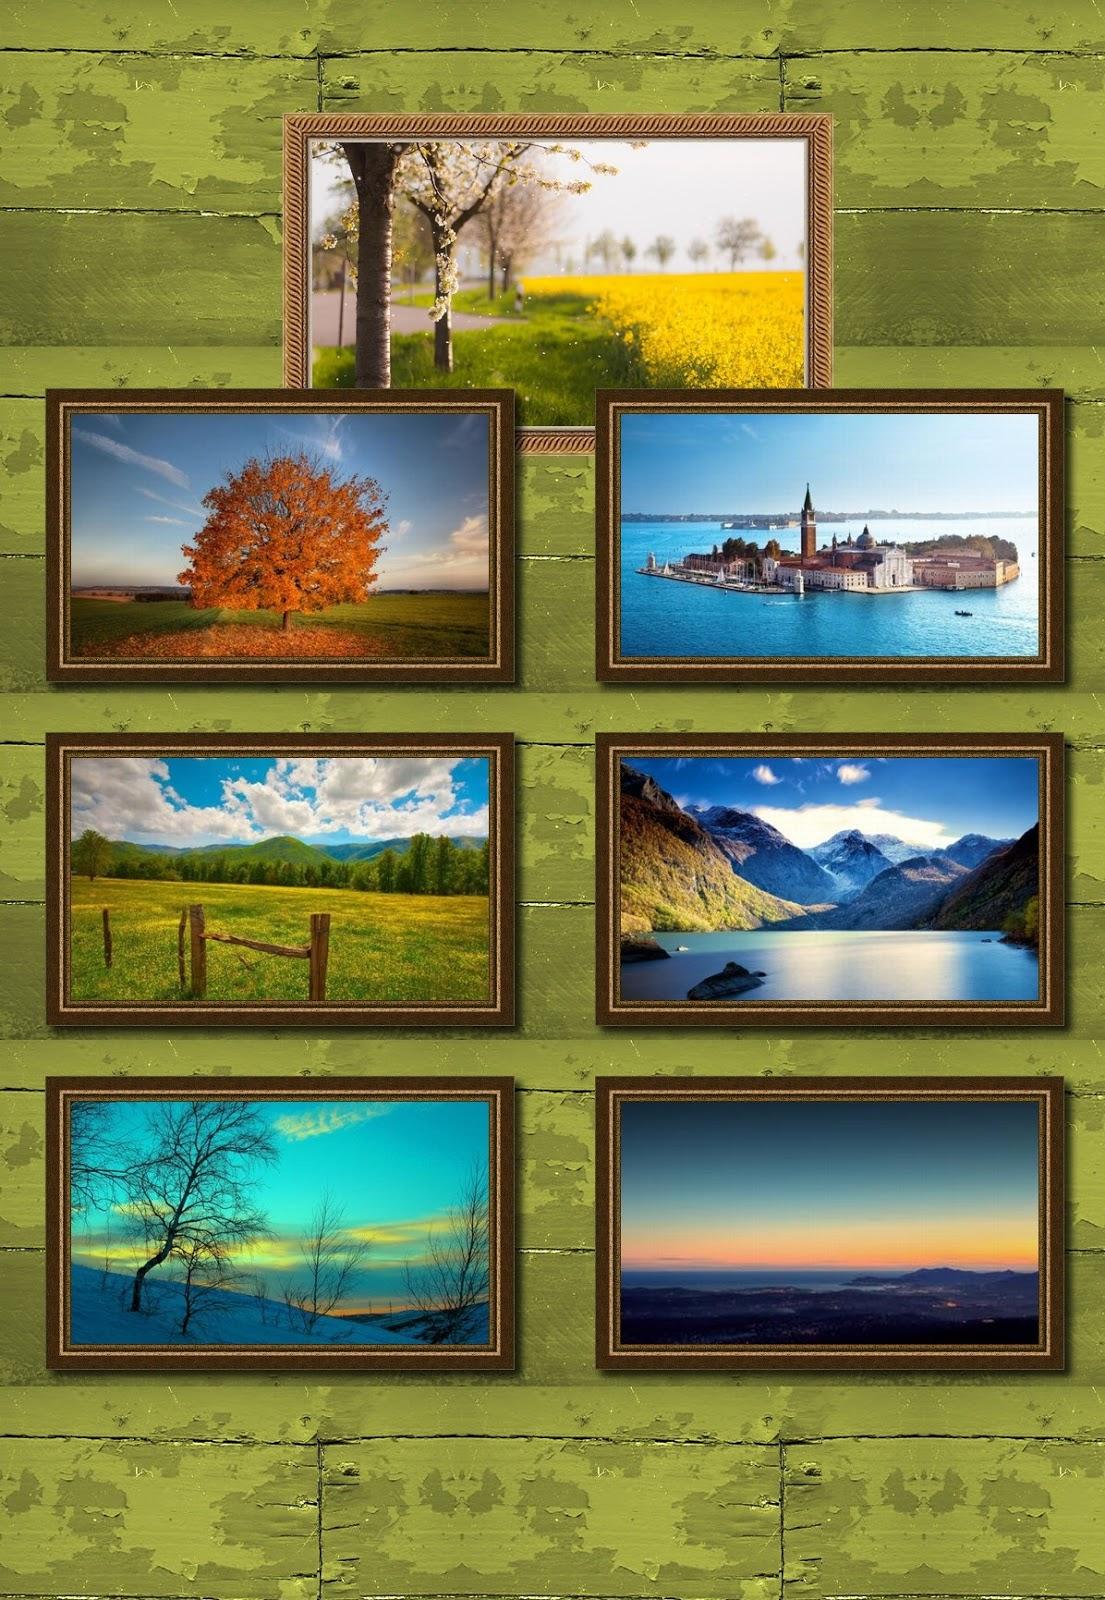 http://4.bp.blogspot.com/-smmEjEn5vQc/ULsD_5273lI/AAAAAAAAARA/mTme-MMLmww/s1600/40_Wonderfull_Natural_Wallpaper.jpg